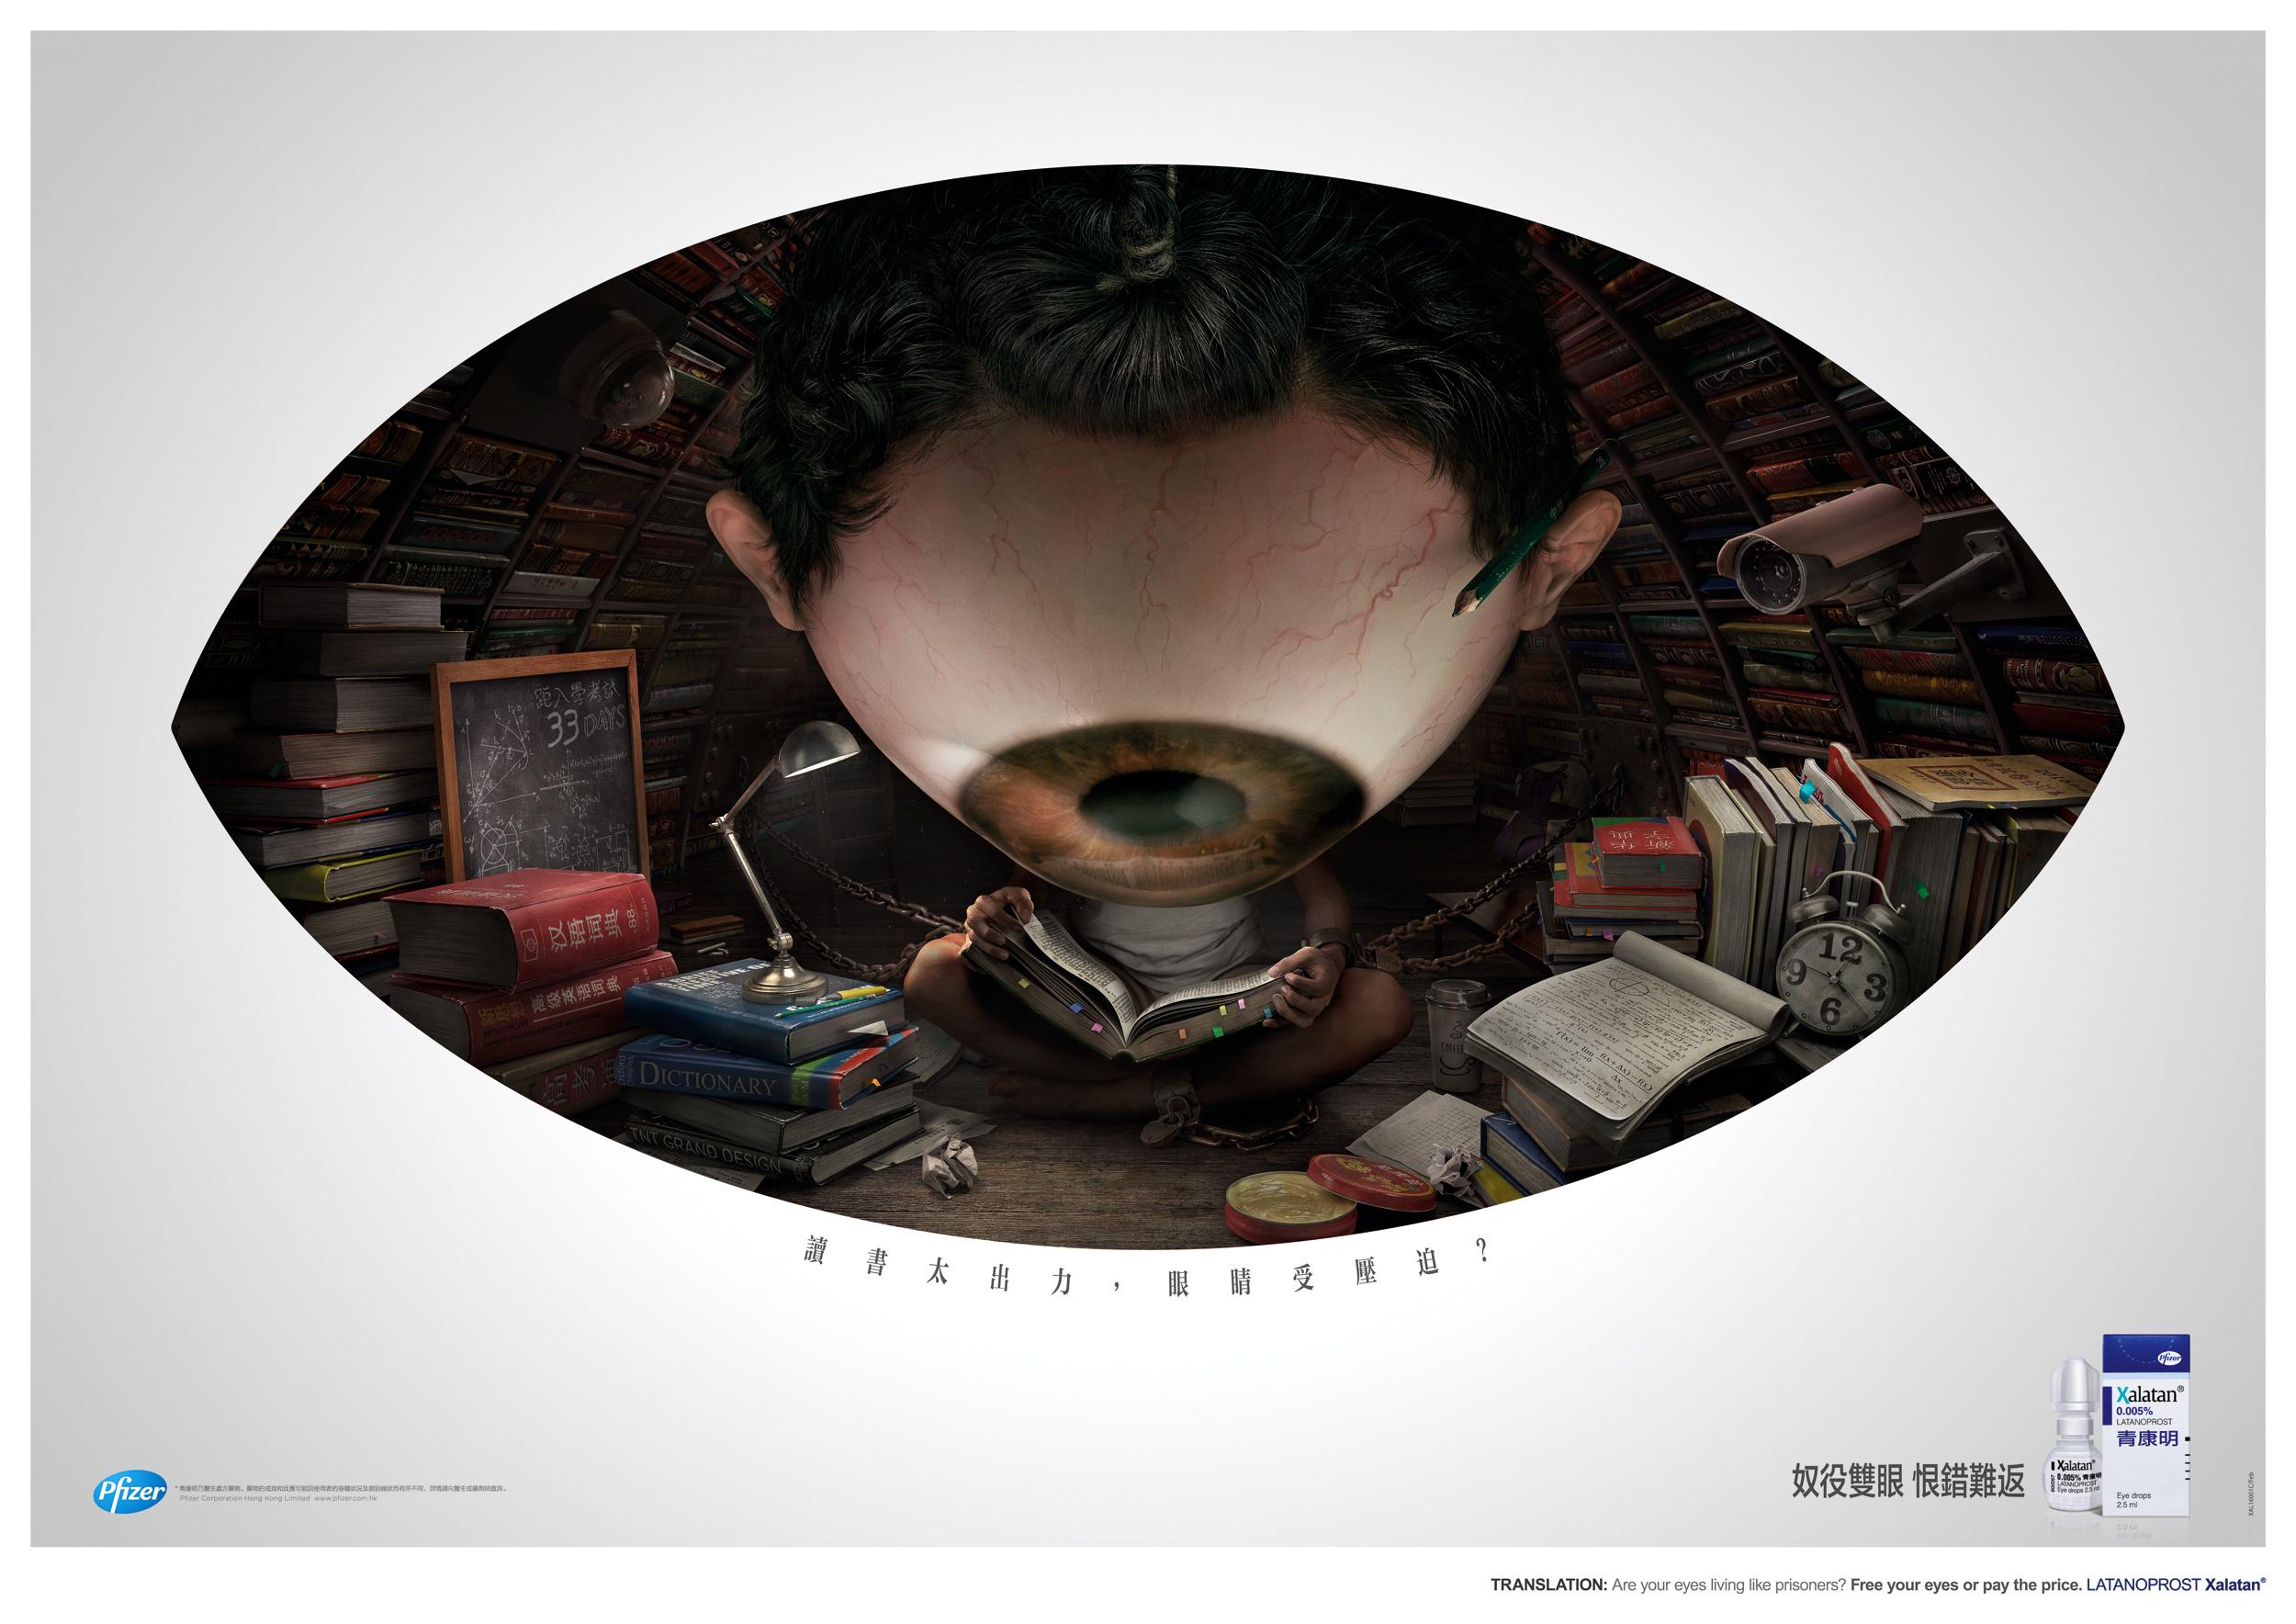 Xalatan Eyeball Slave Student_Srgb.jpg